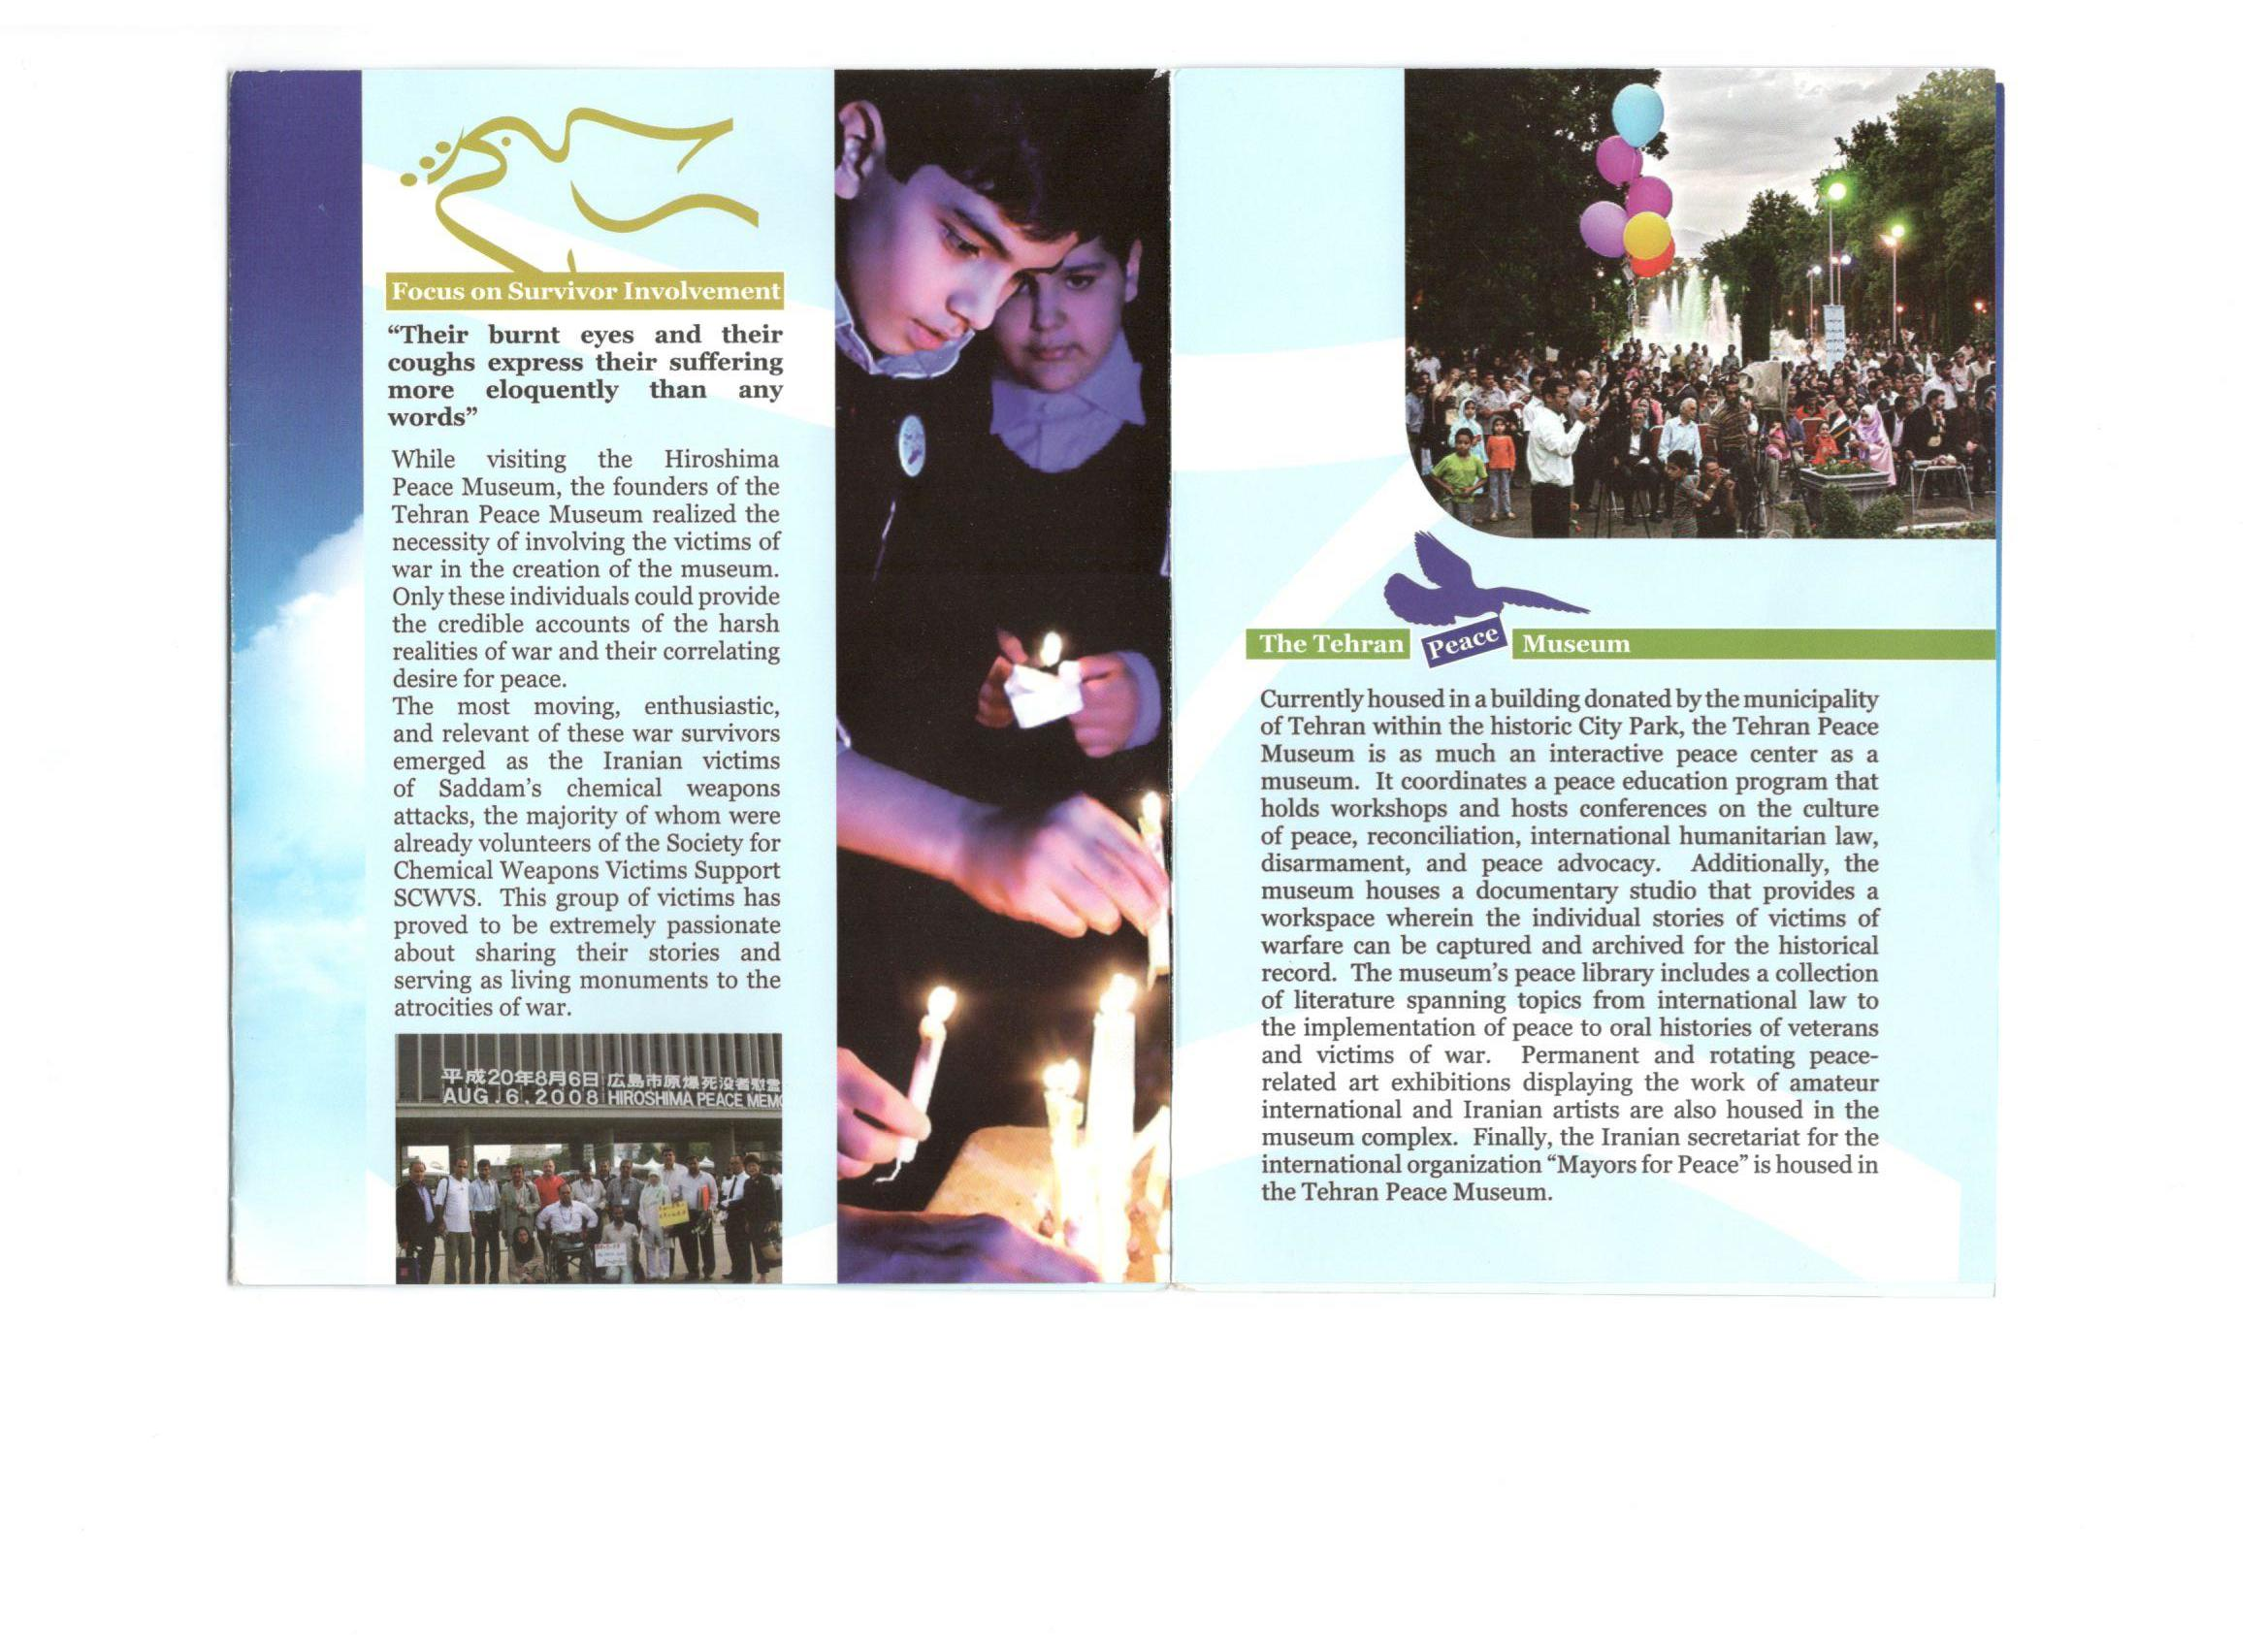 Rabbani Education Complex - World Peace Flame2.jpg